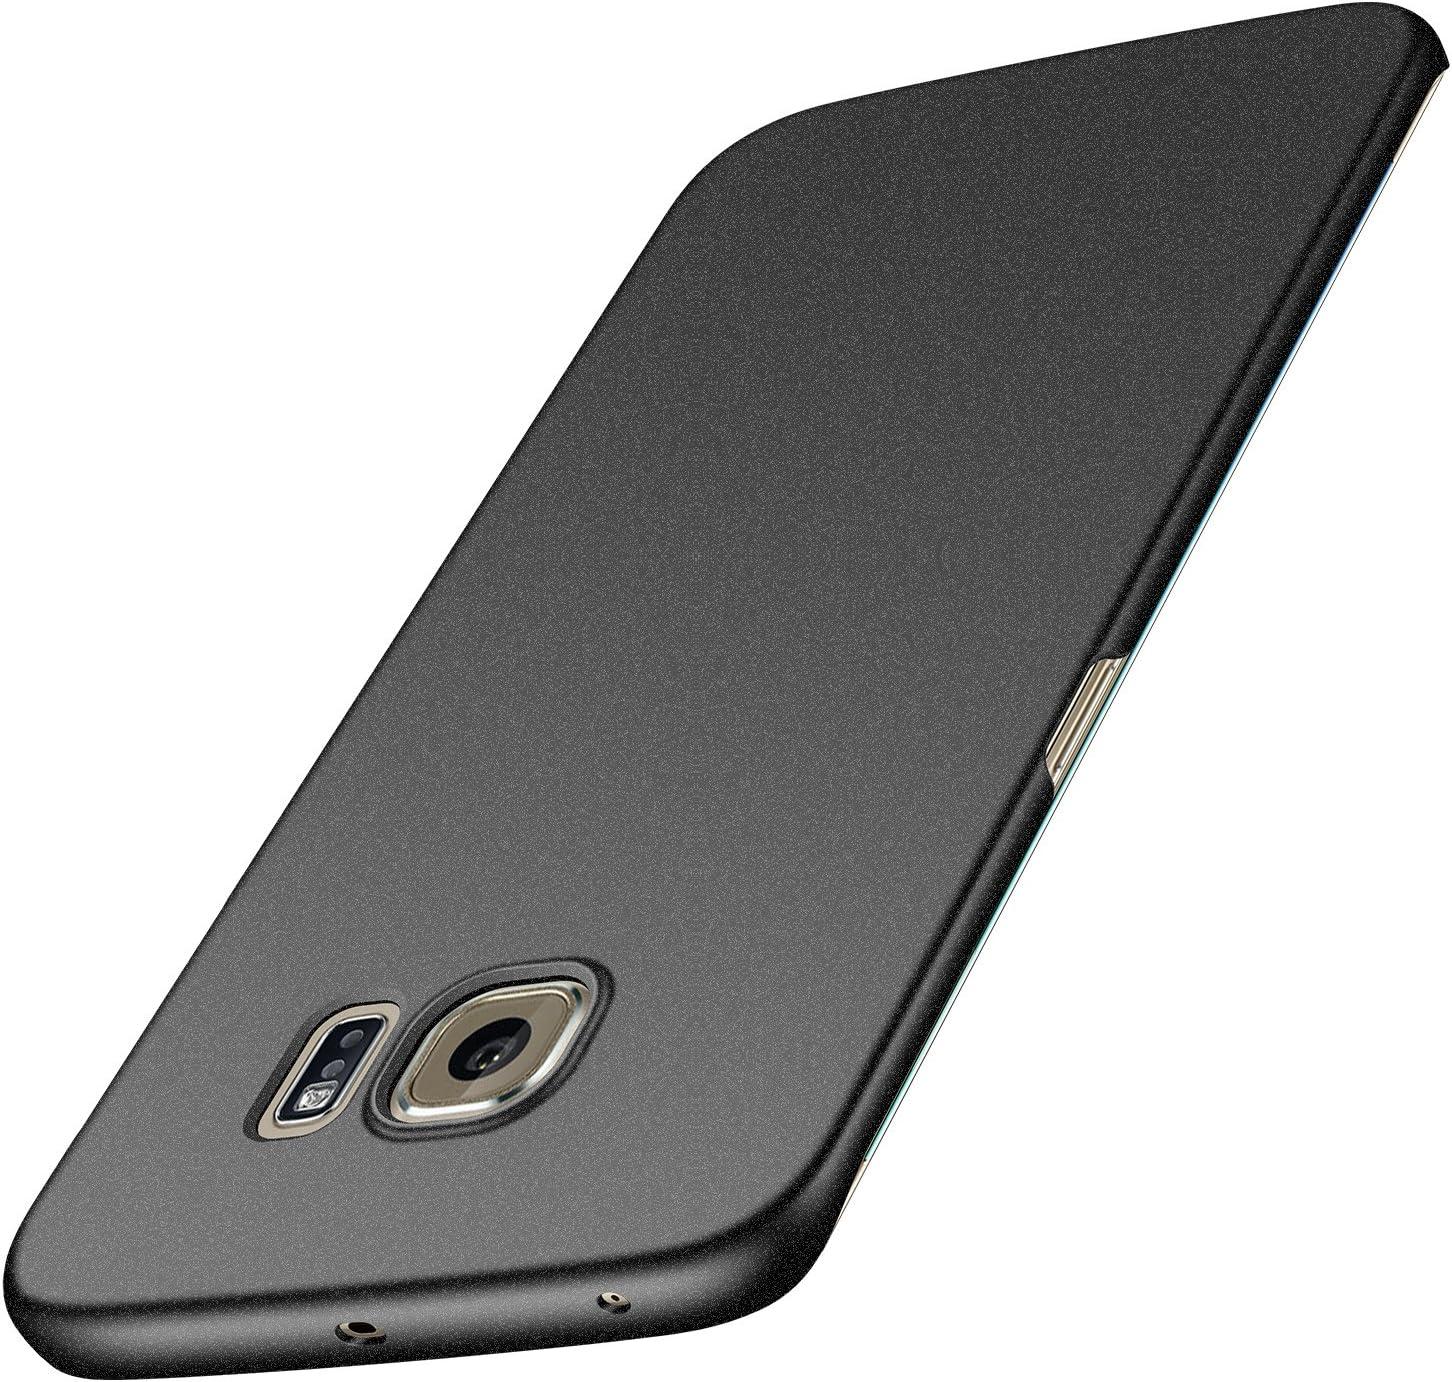 Anccer Funda Samsung Galaxy S6 Edge Plus [Serie Colorida] [Ultra-Delgado] [Ligera] Anti-rasguños Estuche para Case Samsung Galaxy S6 Edge+ (Grava Negro)